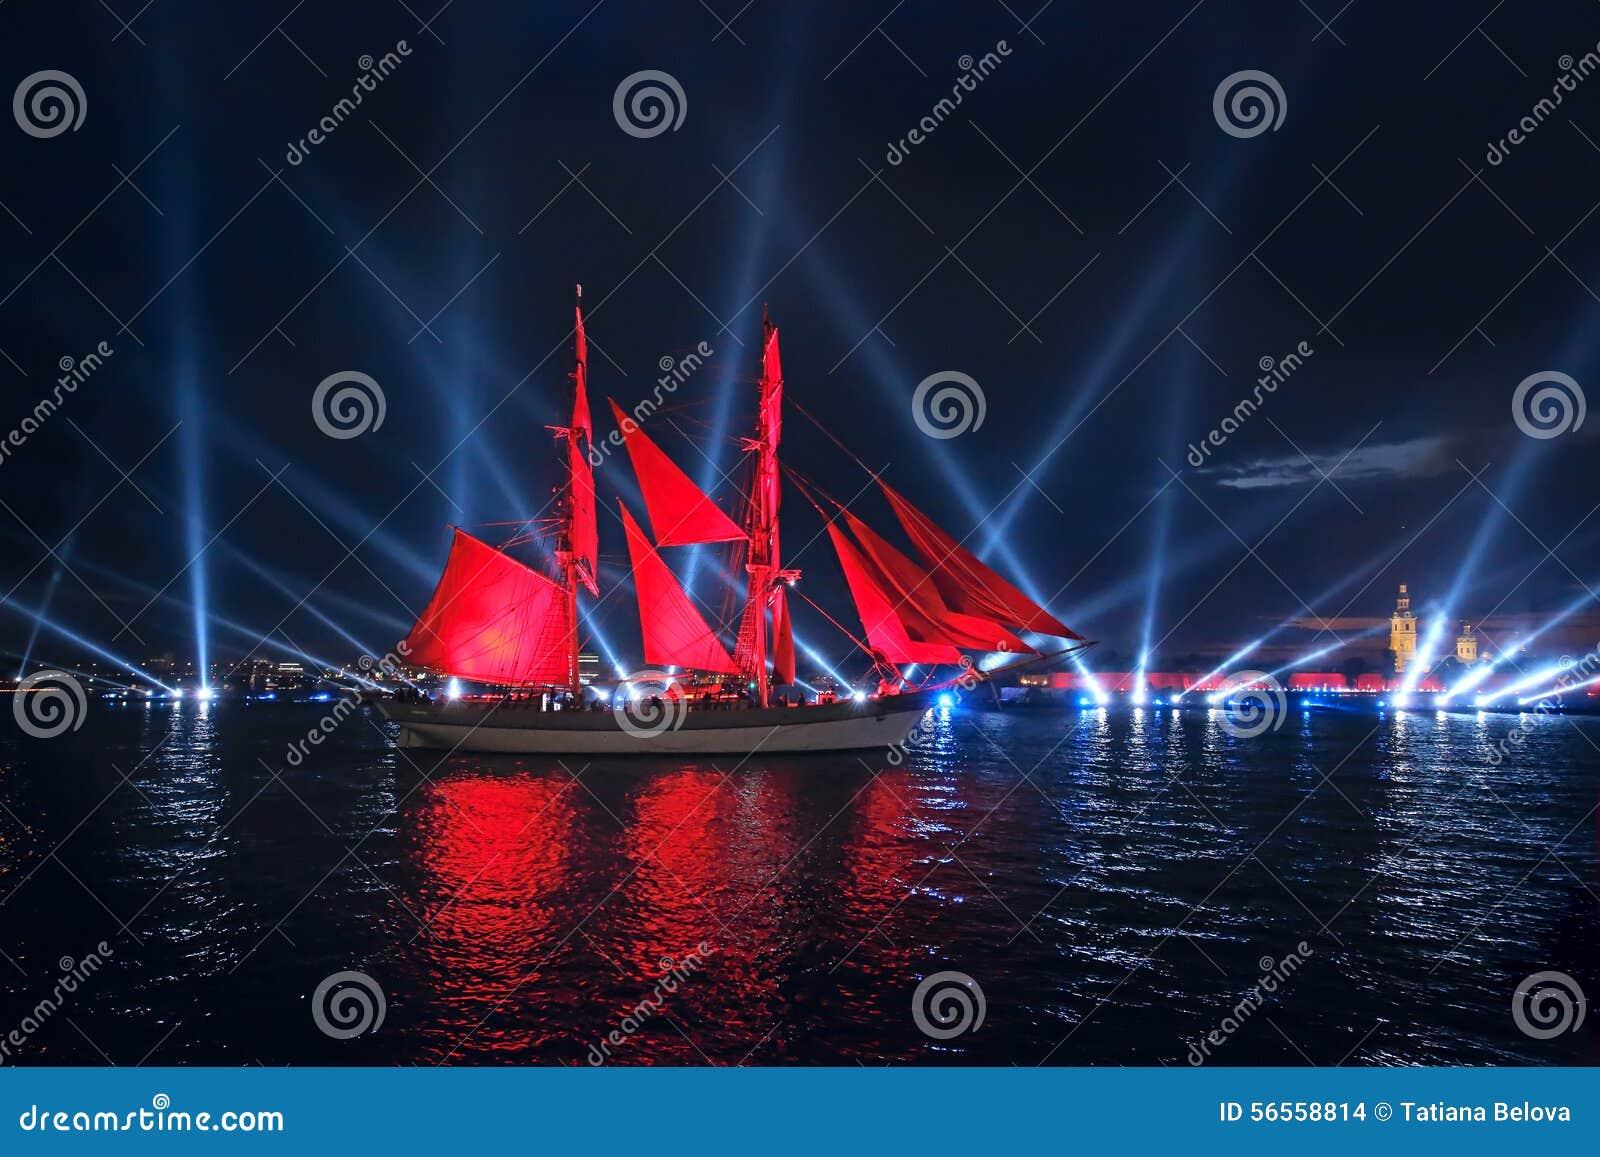 Download Τα ερυθρά πανιά εορτασμού παρουσιάζουν κατά τη διάρκεια του άσπρου φεστιβάλ νυχτών Εκδοτική Στοκ Εικόνα - εικόνα από πυροτέχνημα, μαύρα: 56558814